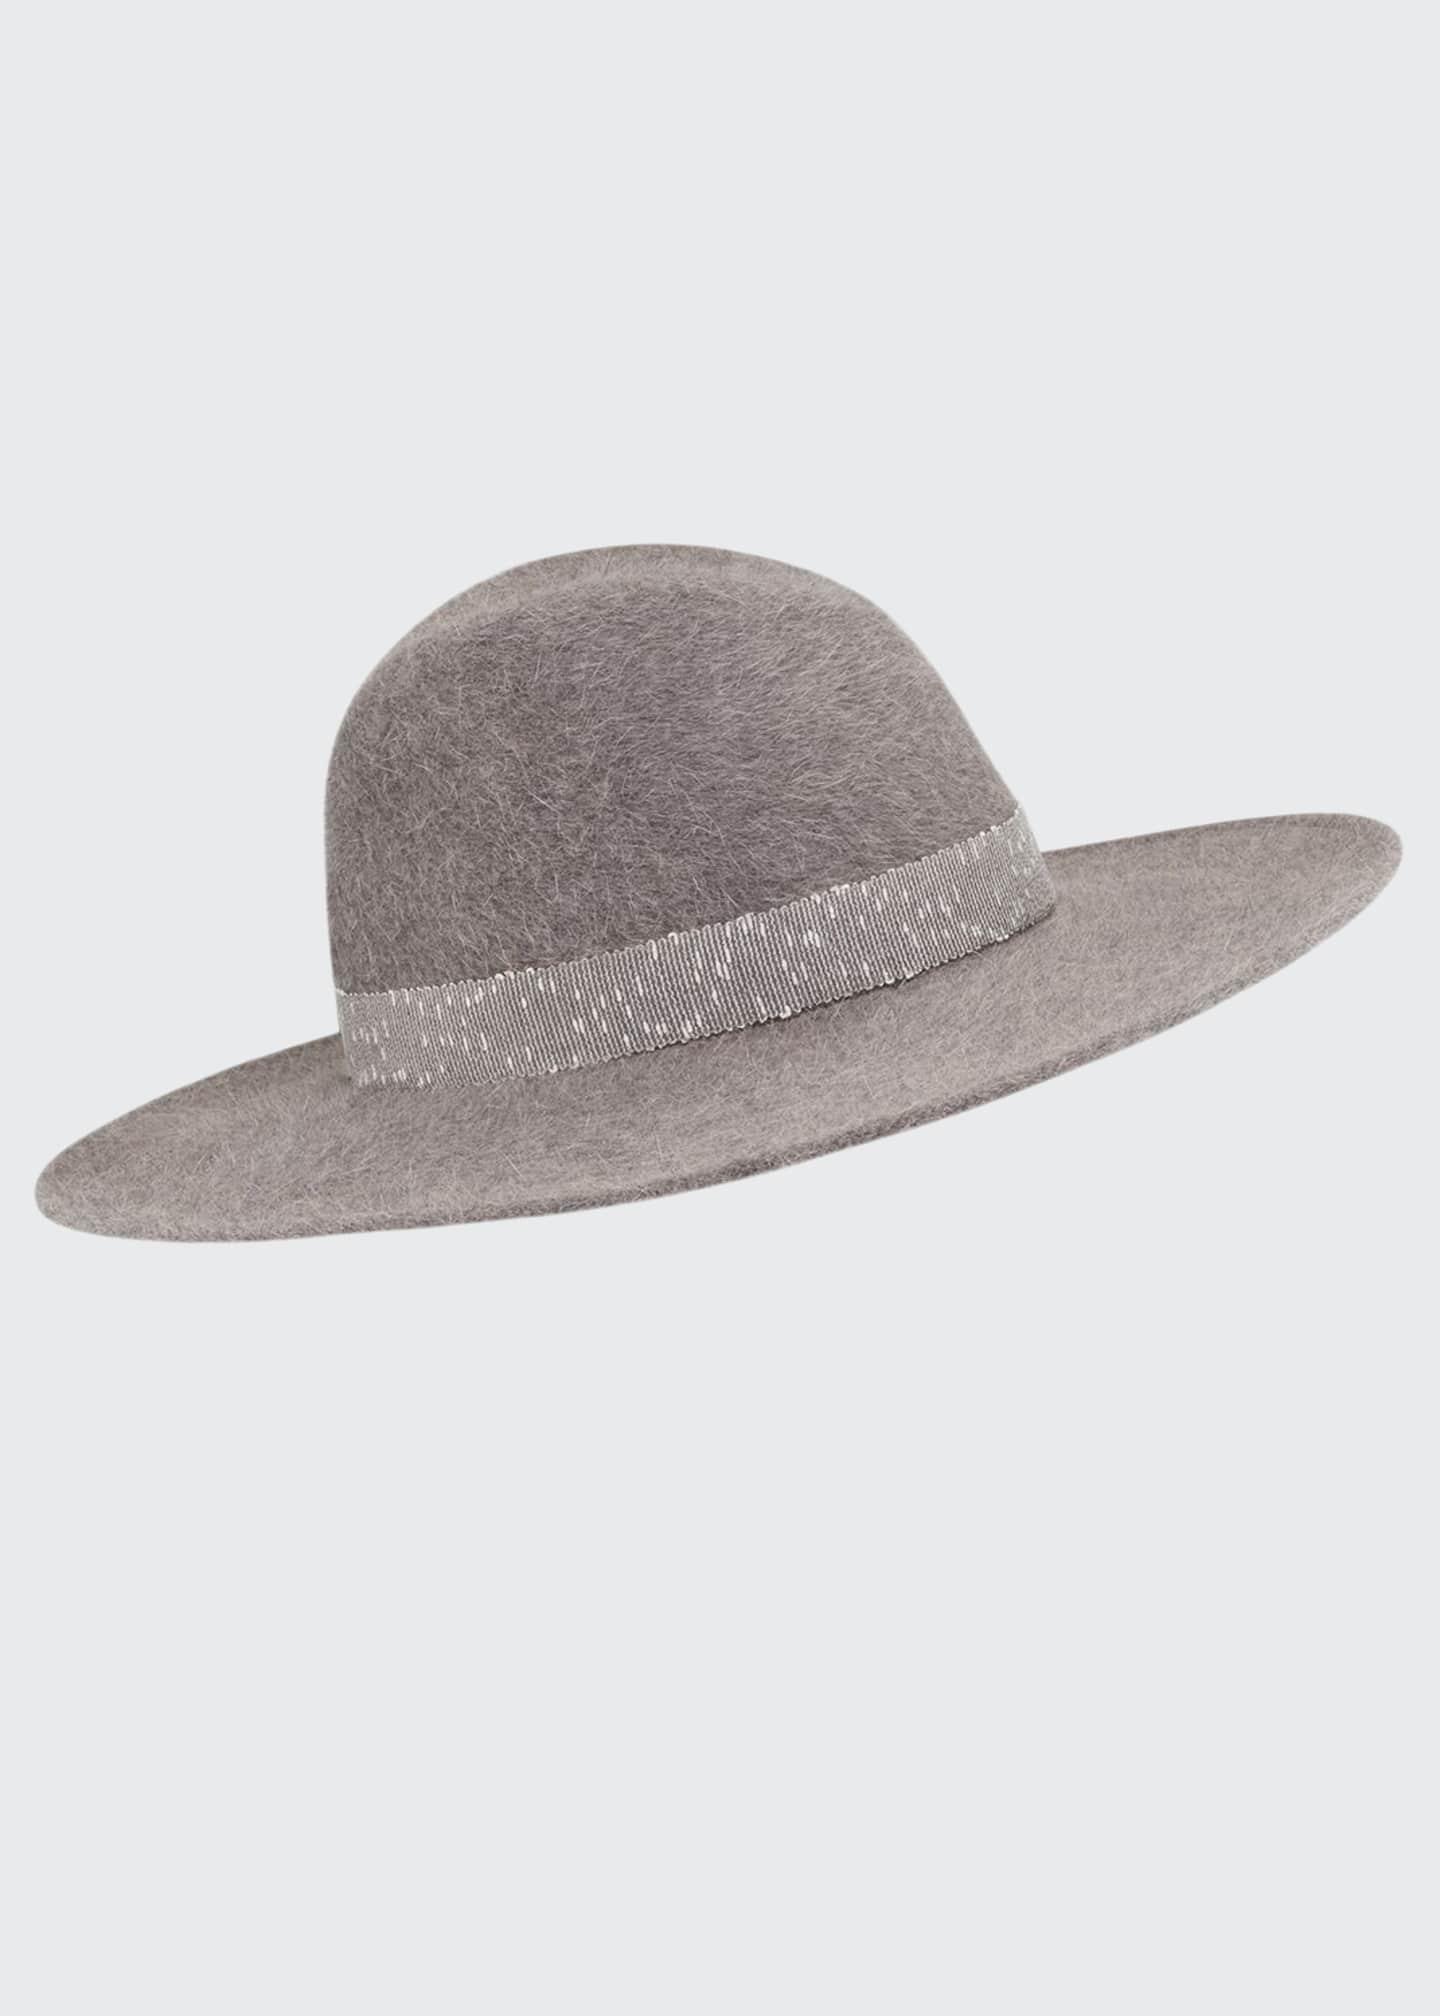 Gigi Burris Jeanne Salome Felt Fedora Hat